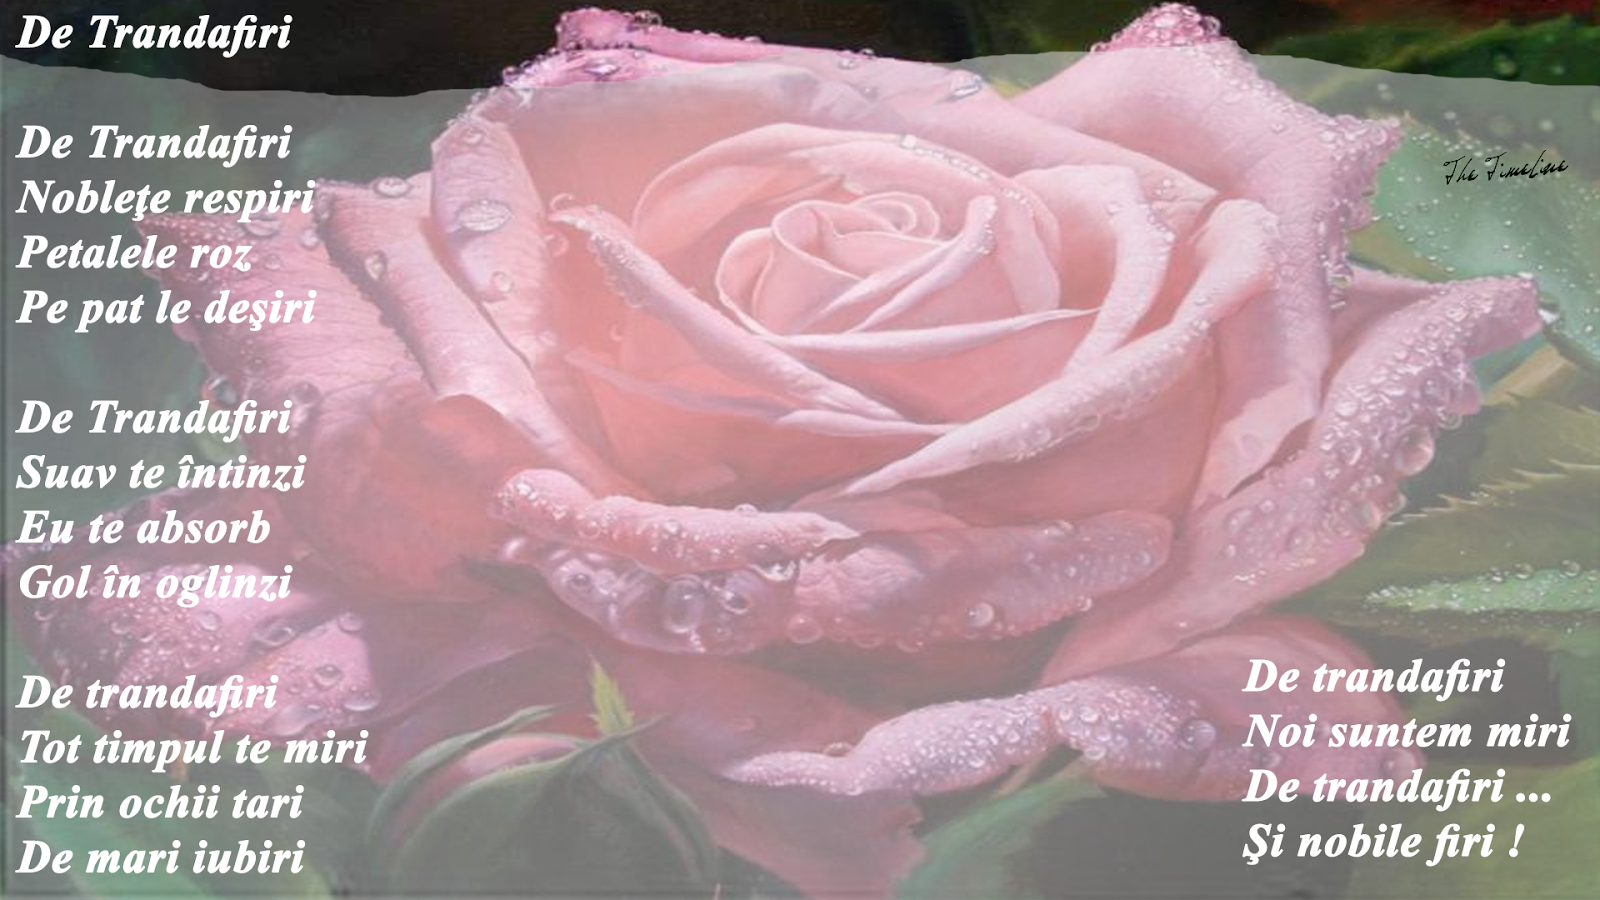 de trandafiri dragoste noblete iubire Maria Teodorescu Bahnareanu Wrinkles on my Timeline